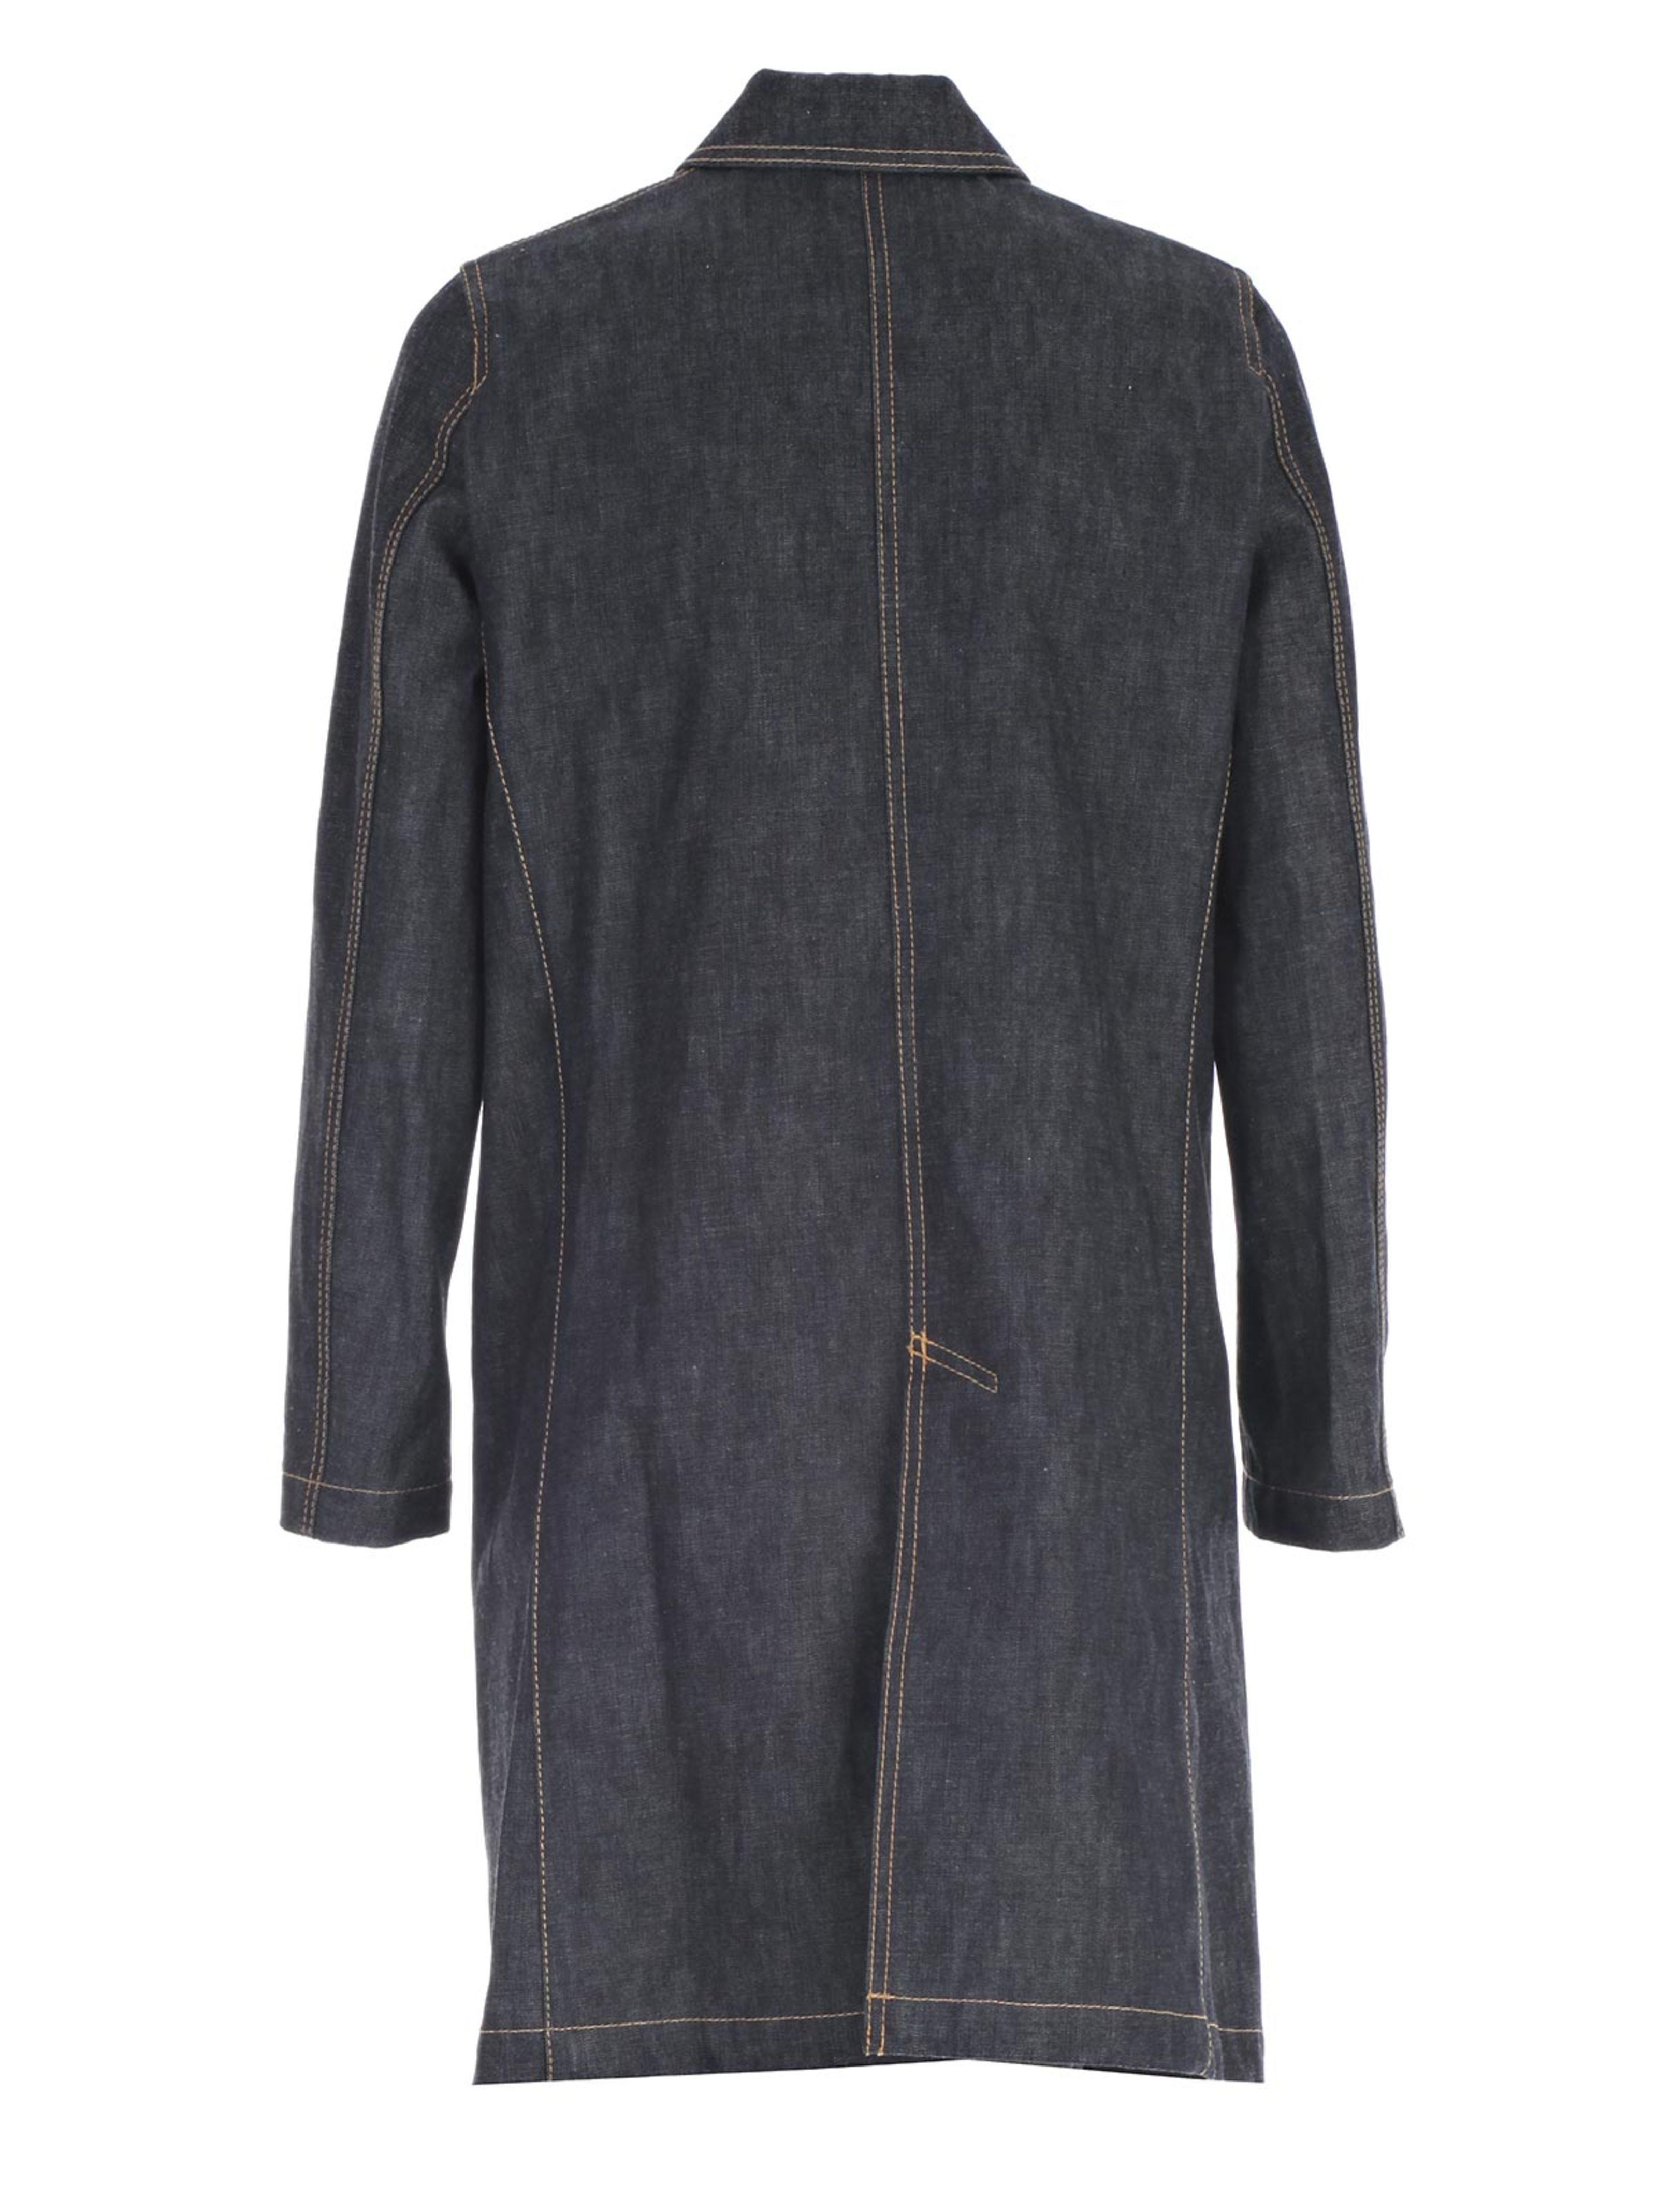 Mackintosh - Mackintosh Raincoat - Blue, Women's Raincoats ...